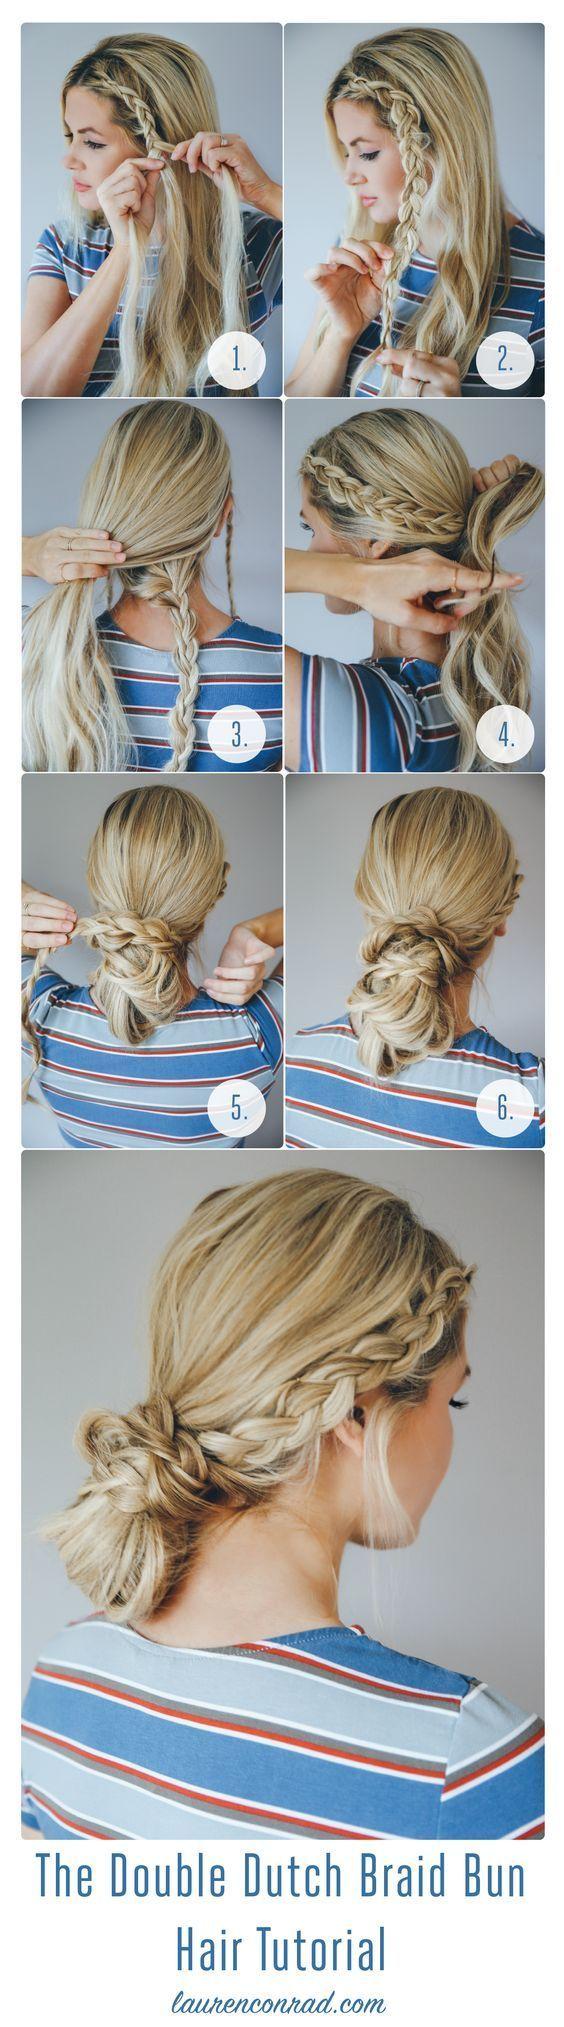 Easy hairstyles for long hair hair pinterest hair hair